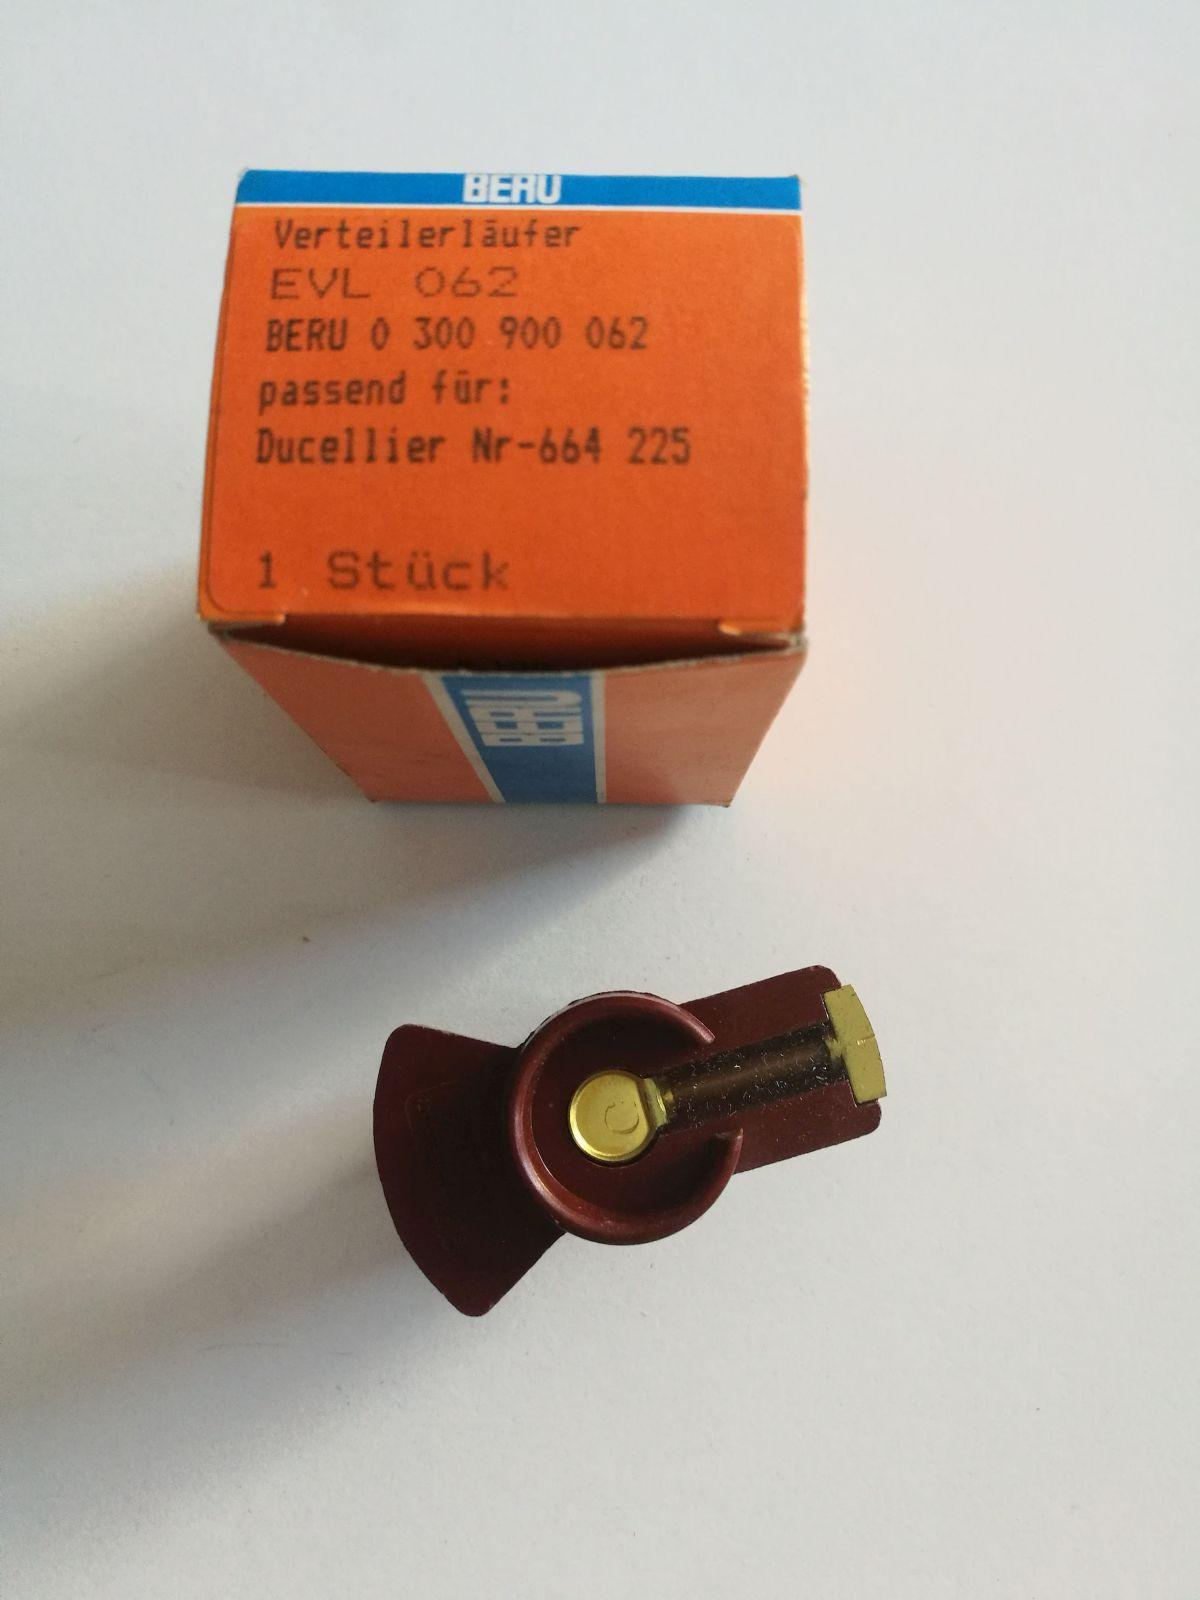 Beru 0300900062 EVL062 Zündverteilerläufer Verteilerläufer distributor rotors